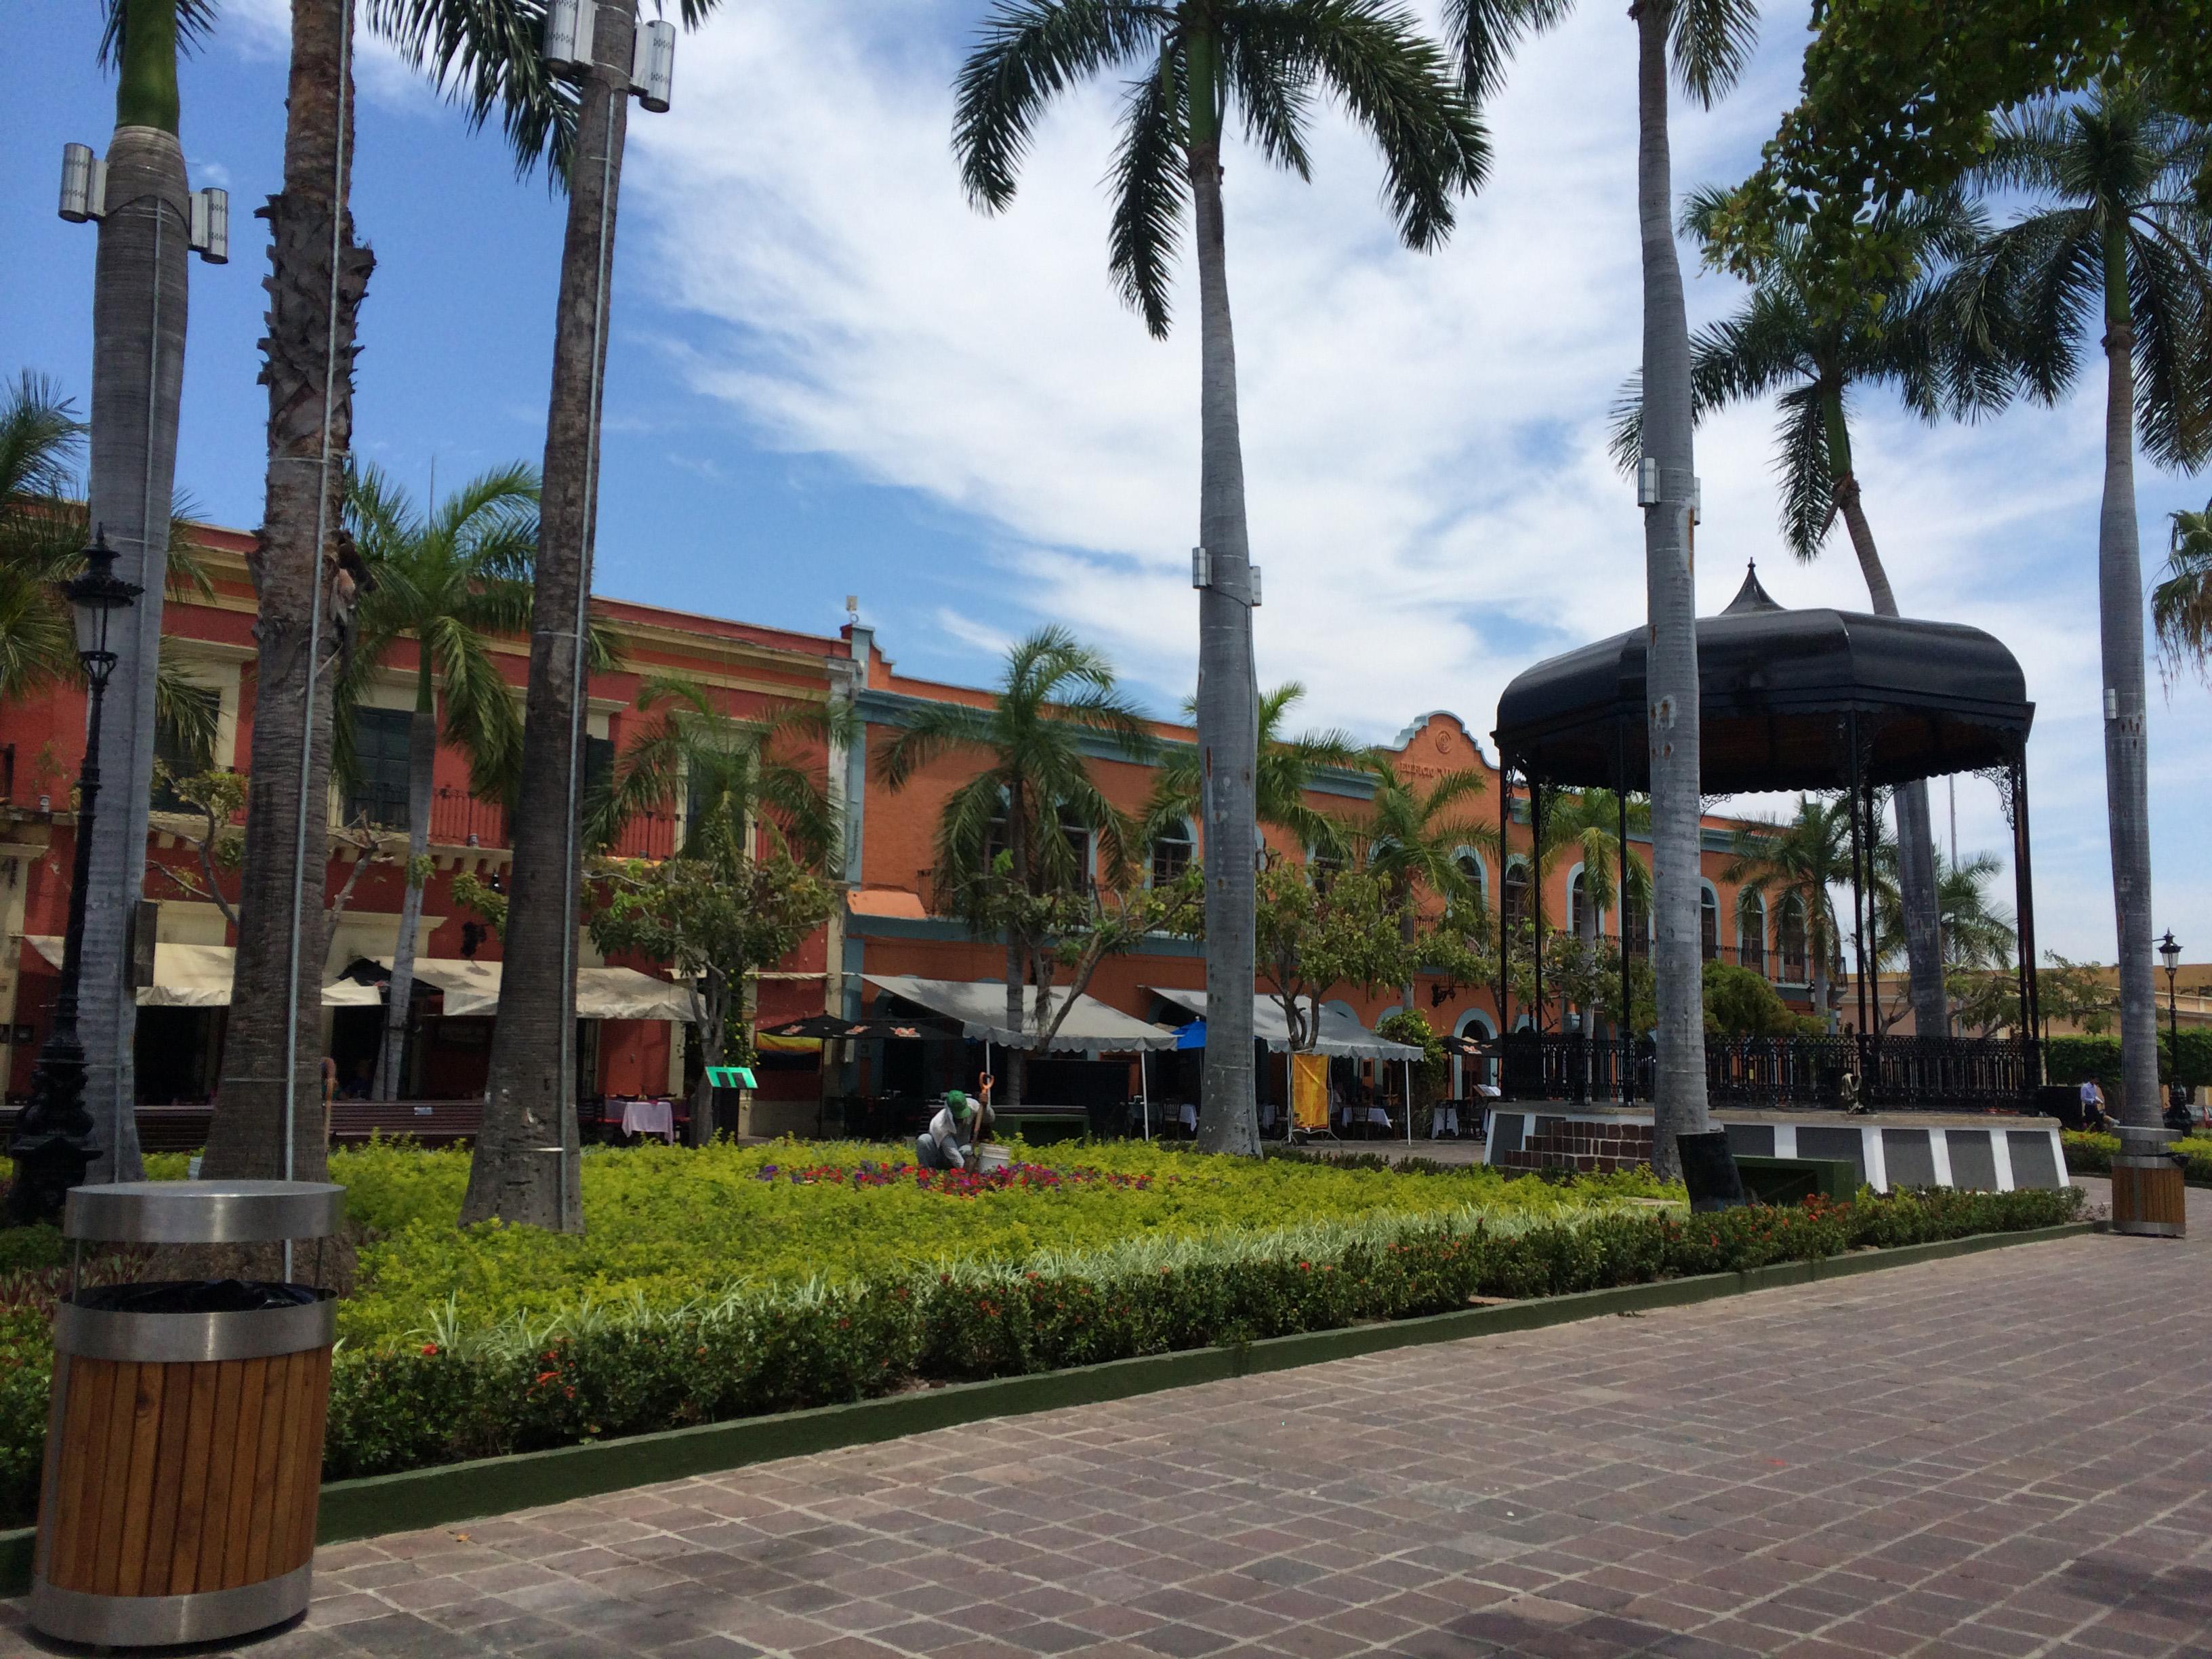 Maz Machado square